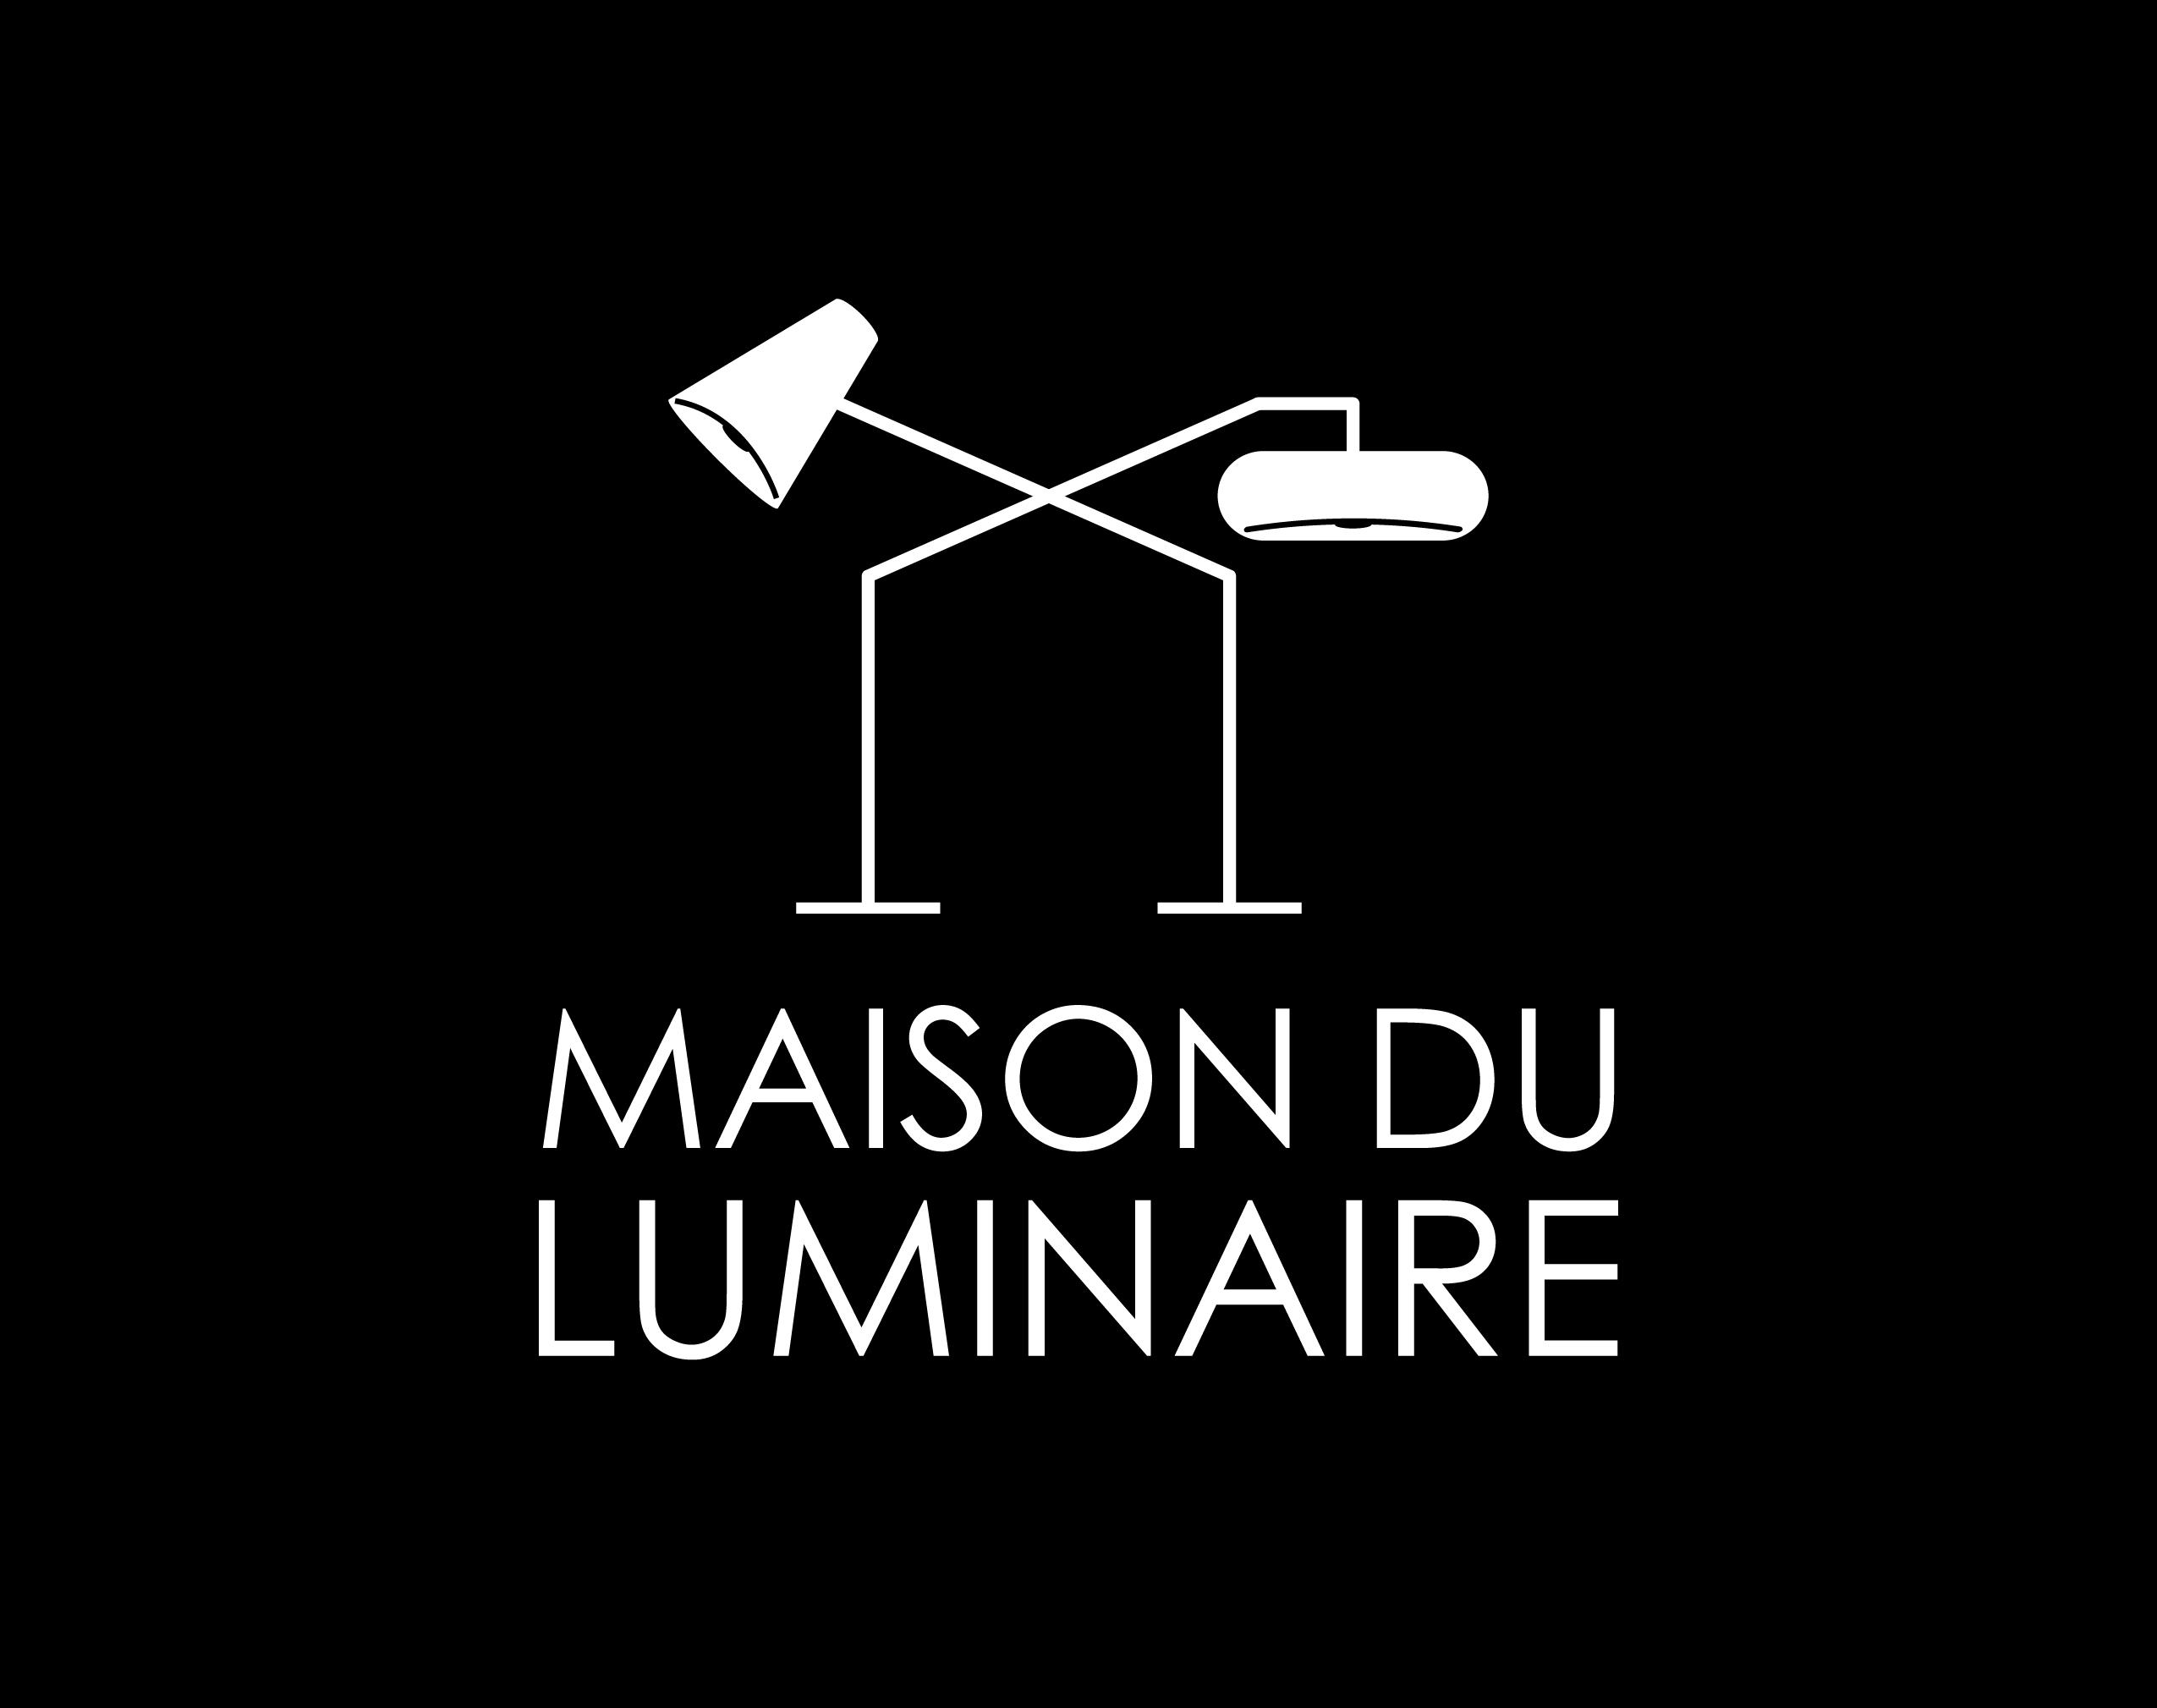 Maison Du Luminaire